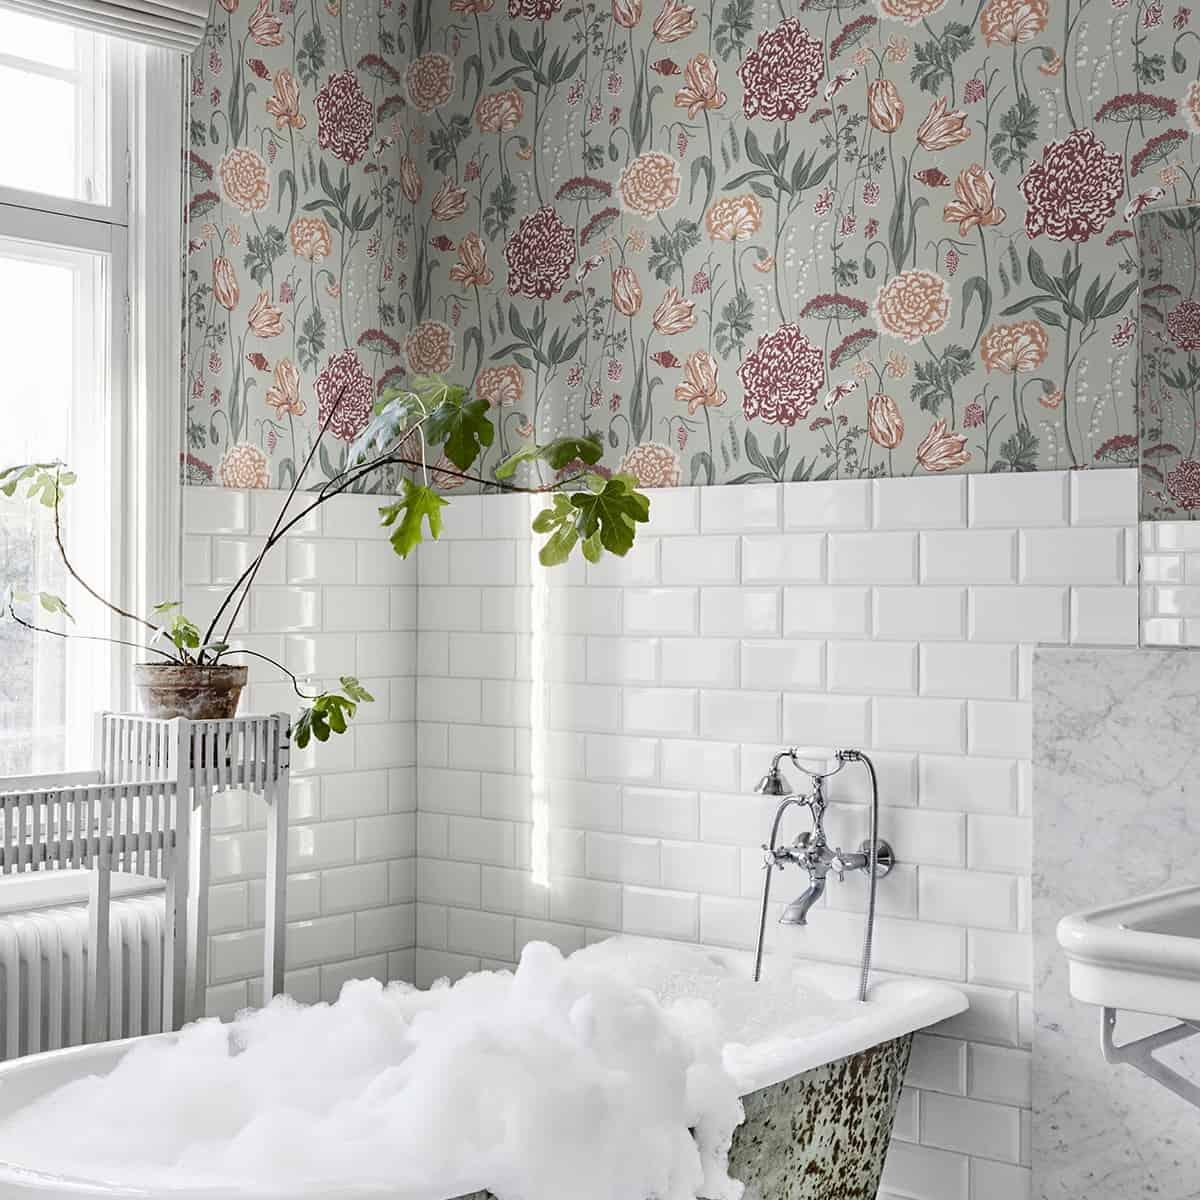 monatare tapet cu flori pe fundal verde intr-o baie retro decorata in alb, verde si tonuri de gri